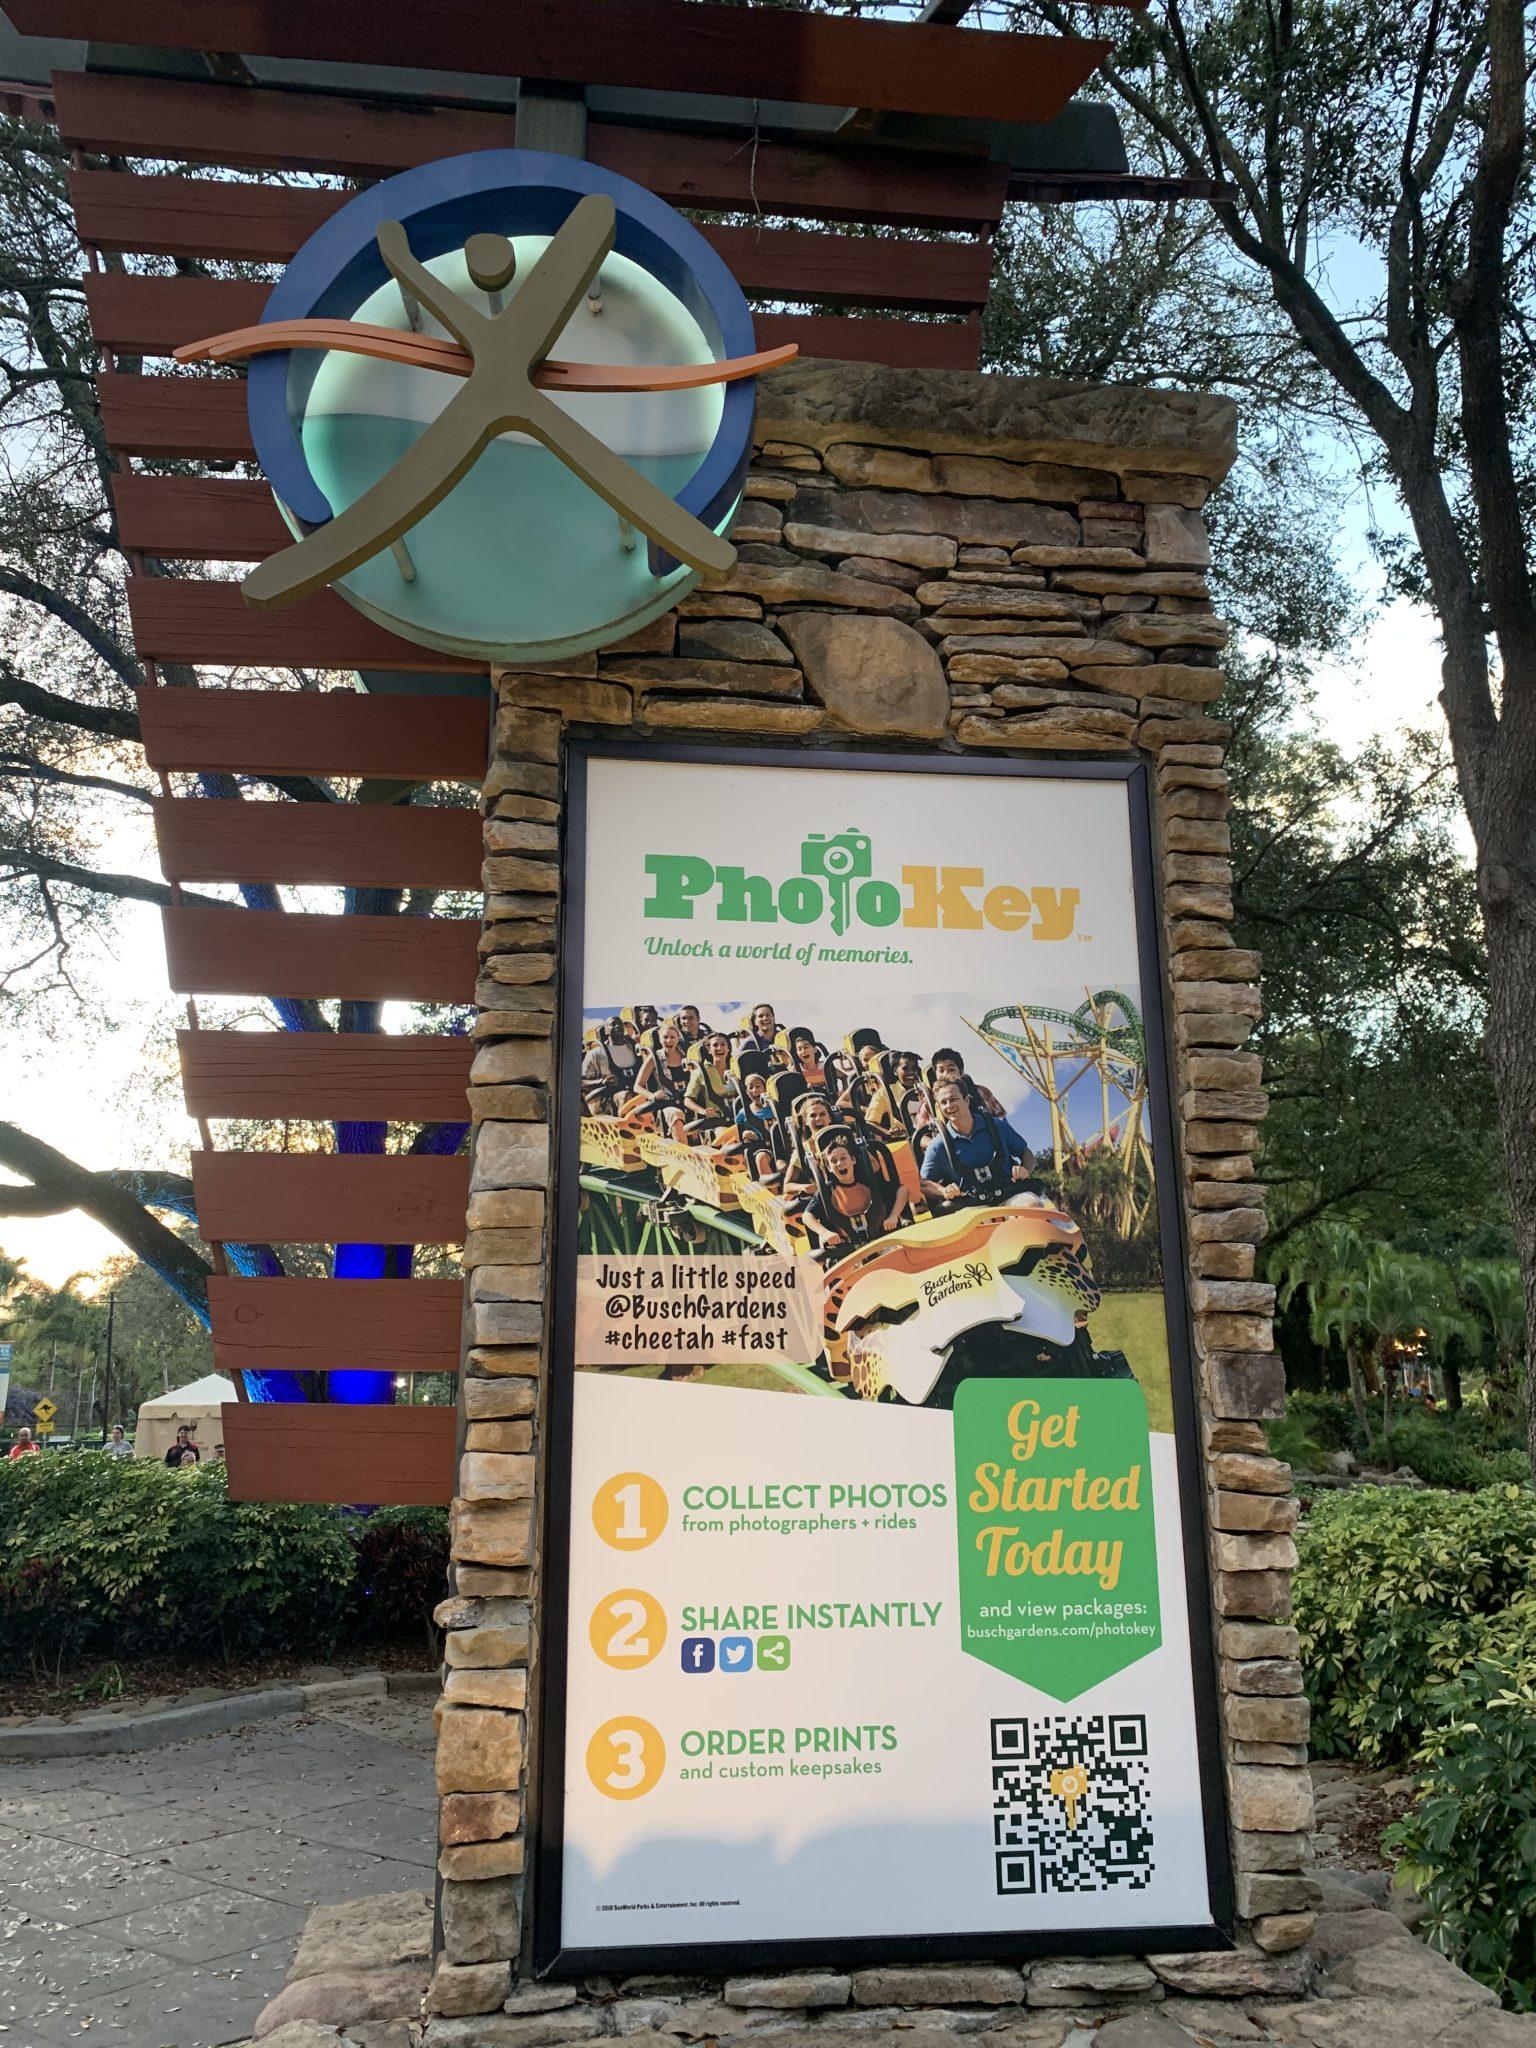 Busch Gardens Tampa Bay photo key photo download service